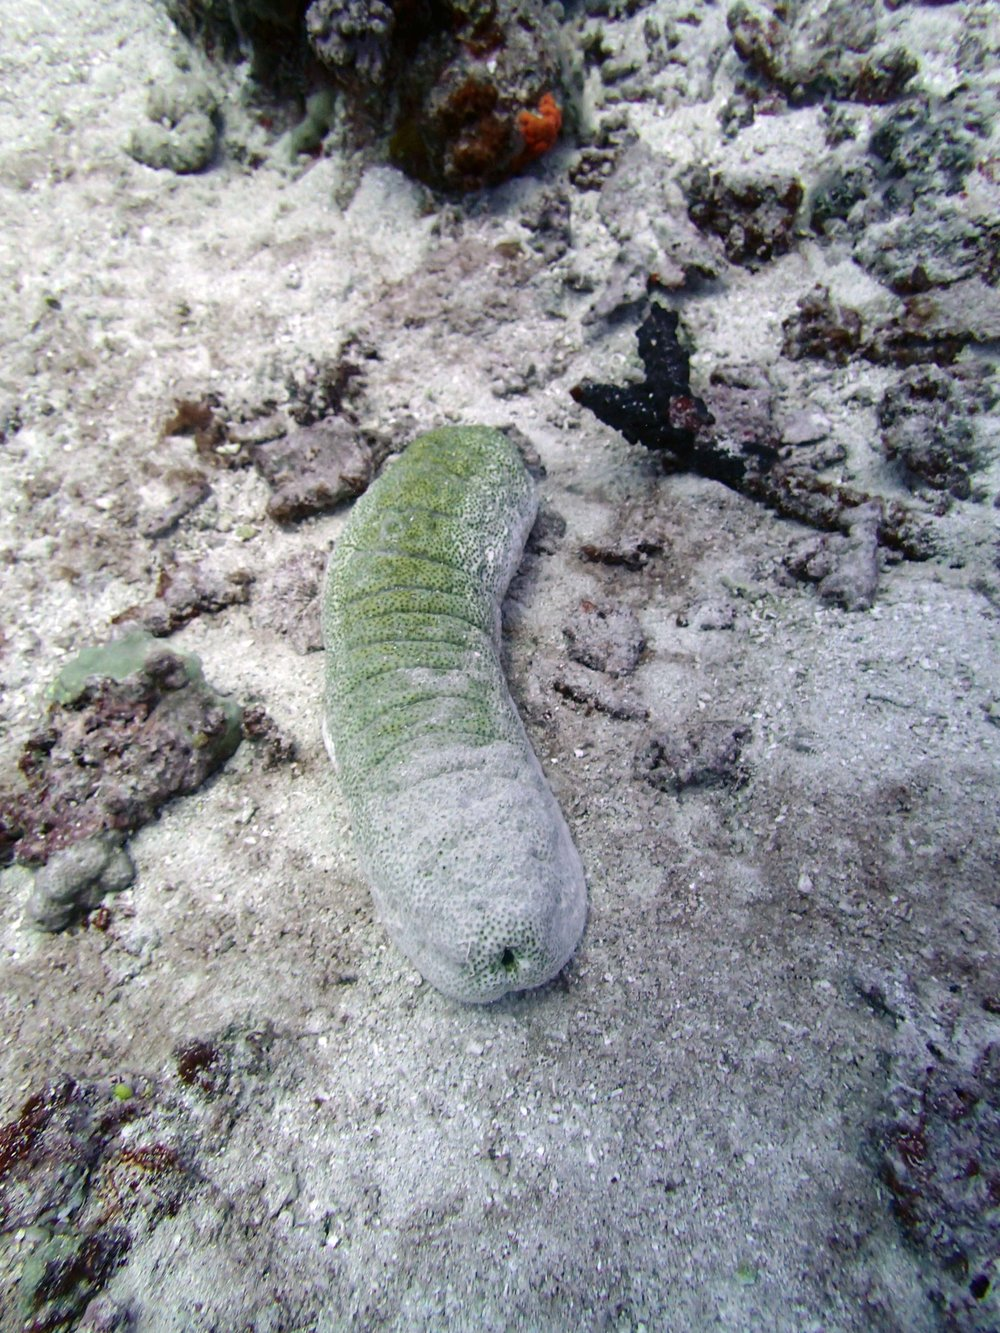 sea cucumber 3.jpg